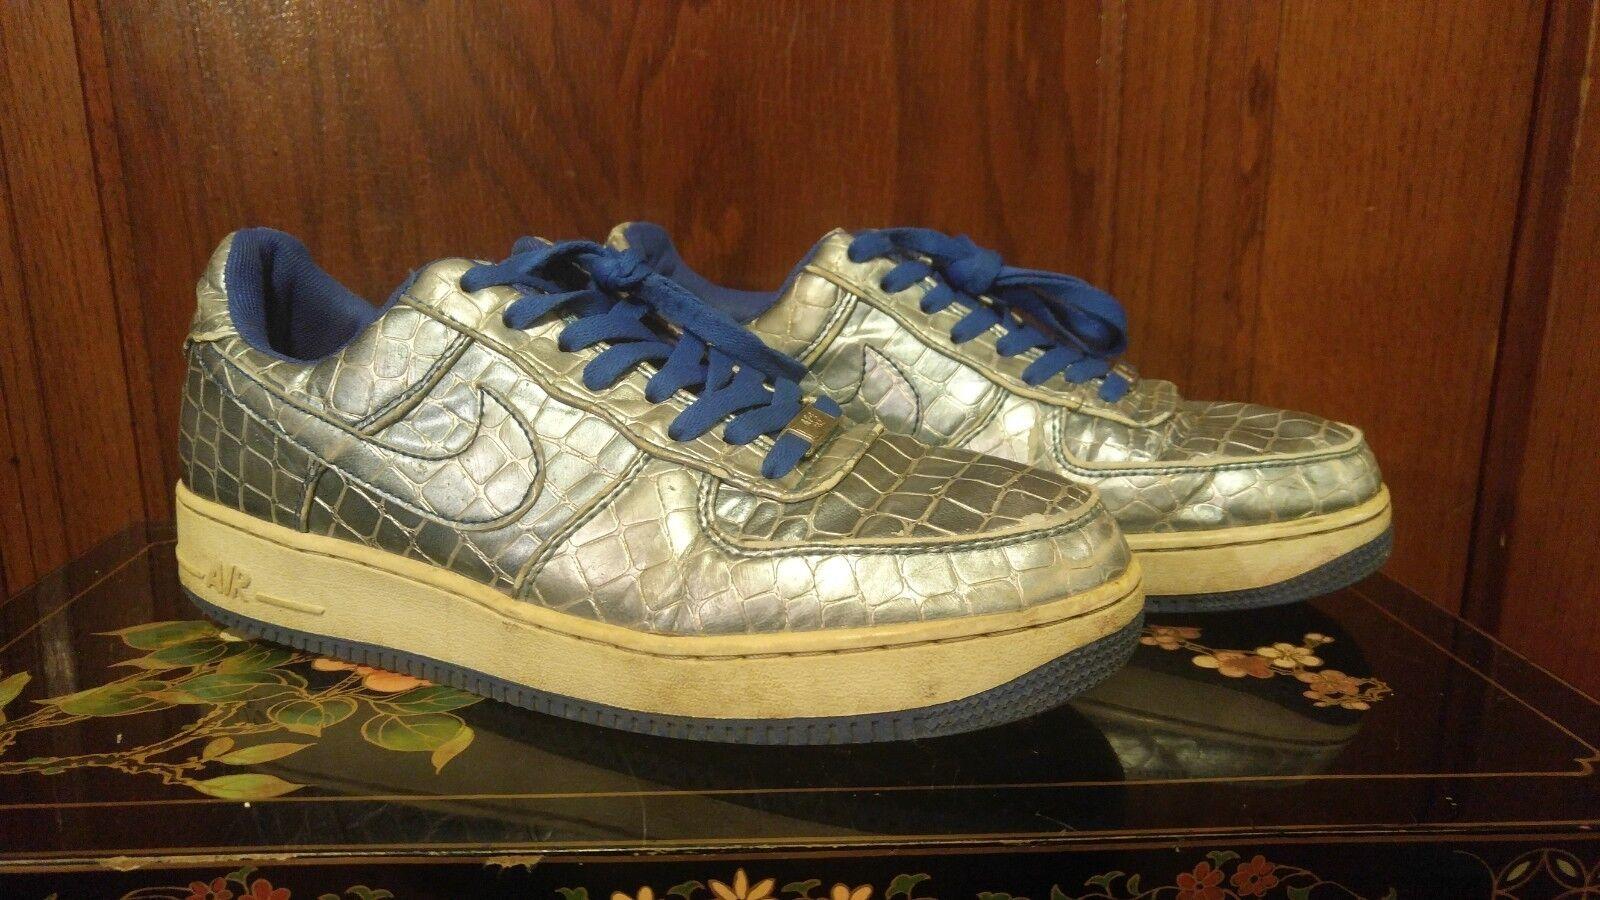 Nike Air Metallic bluee Reptile   Snake Skin shoes